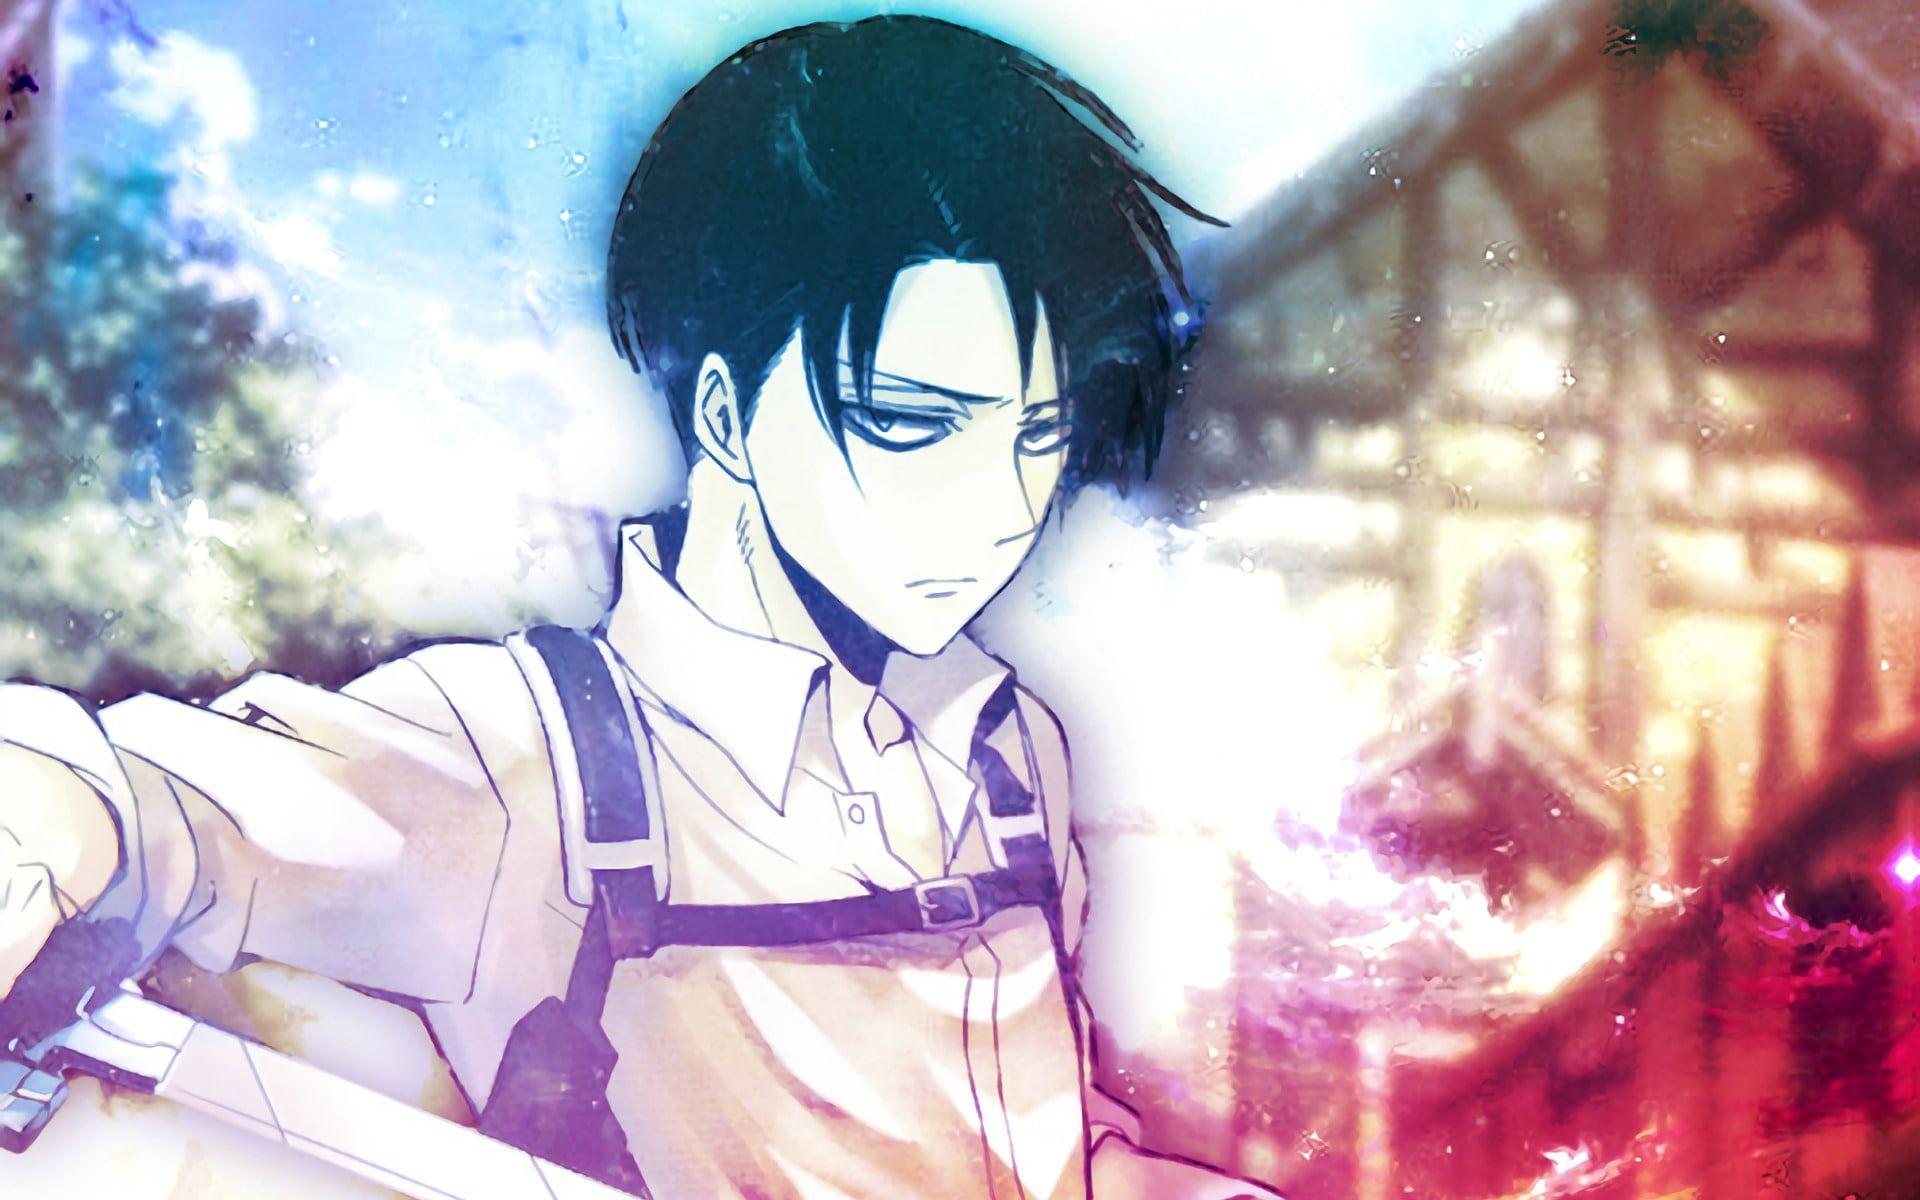 Anime Attack On Titan Levi Ackerman Shingeki No Kyojin